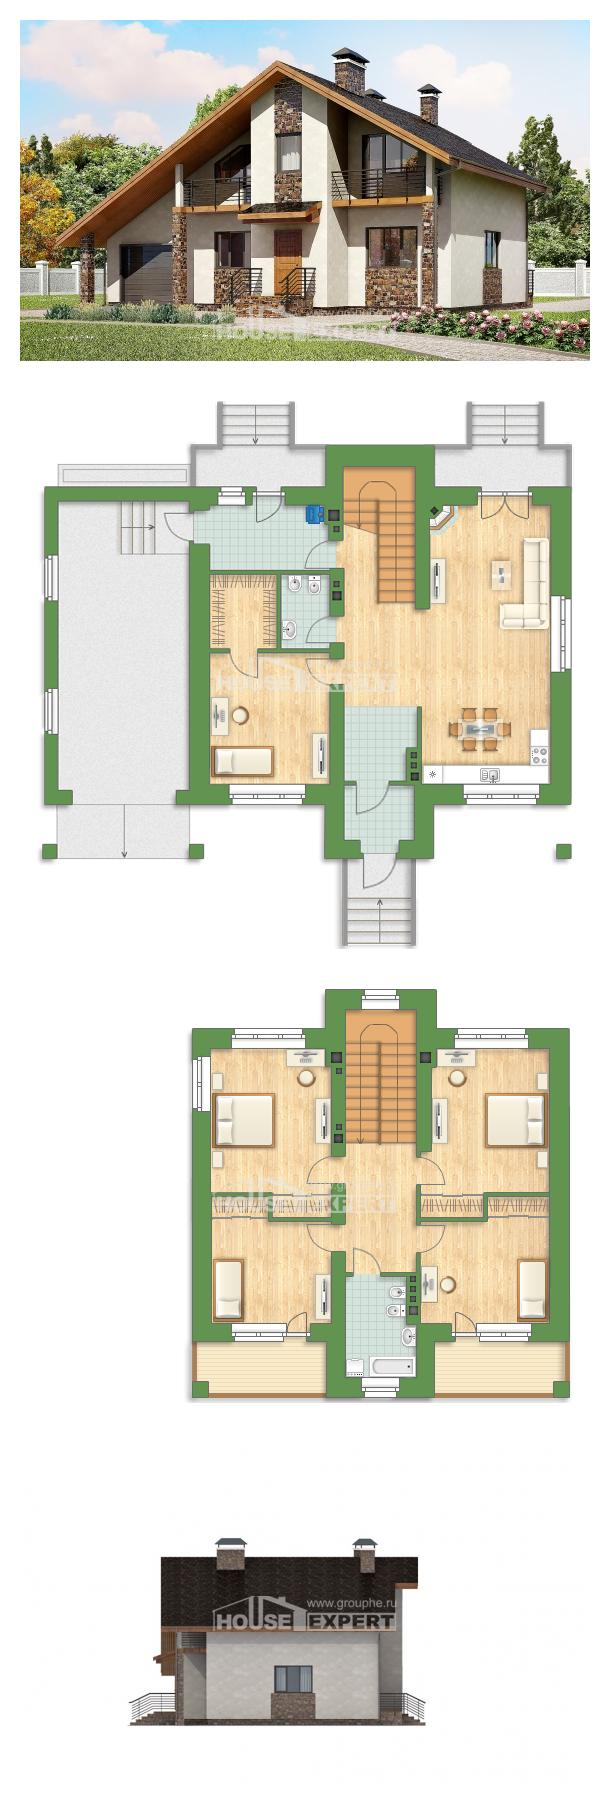 Ev villa projesi 180-008-L | House Expert